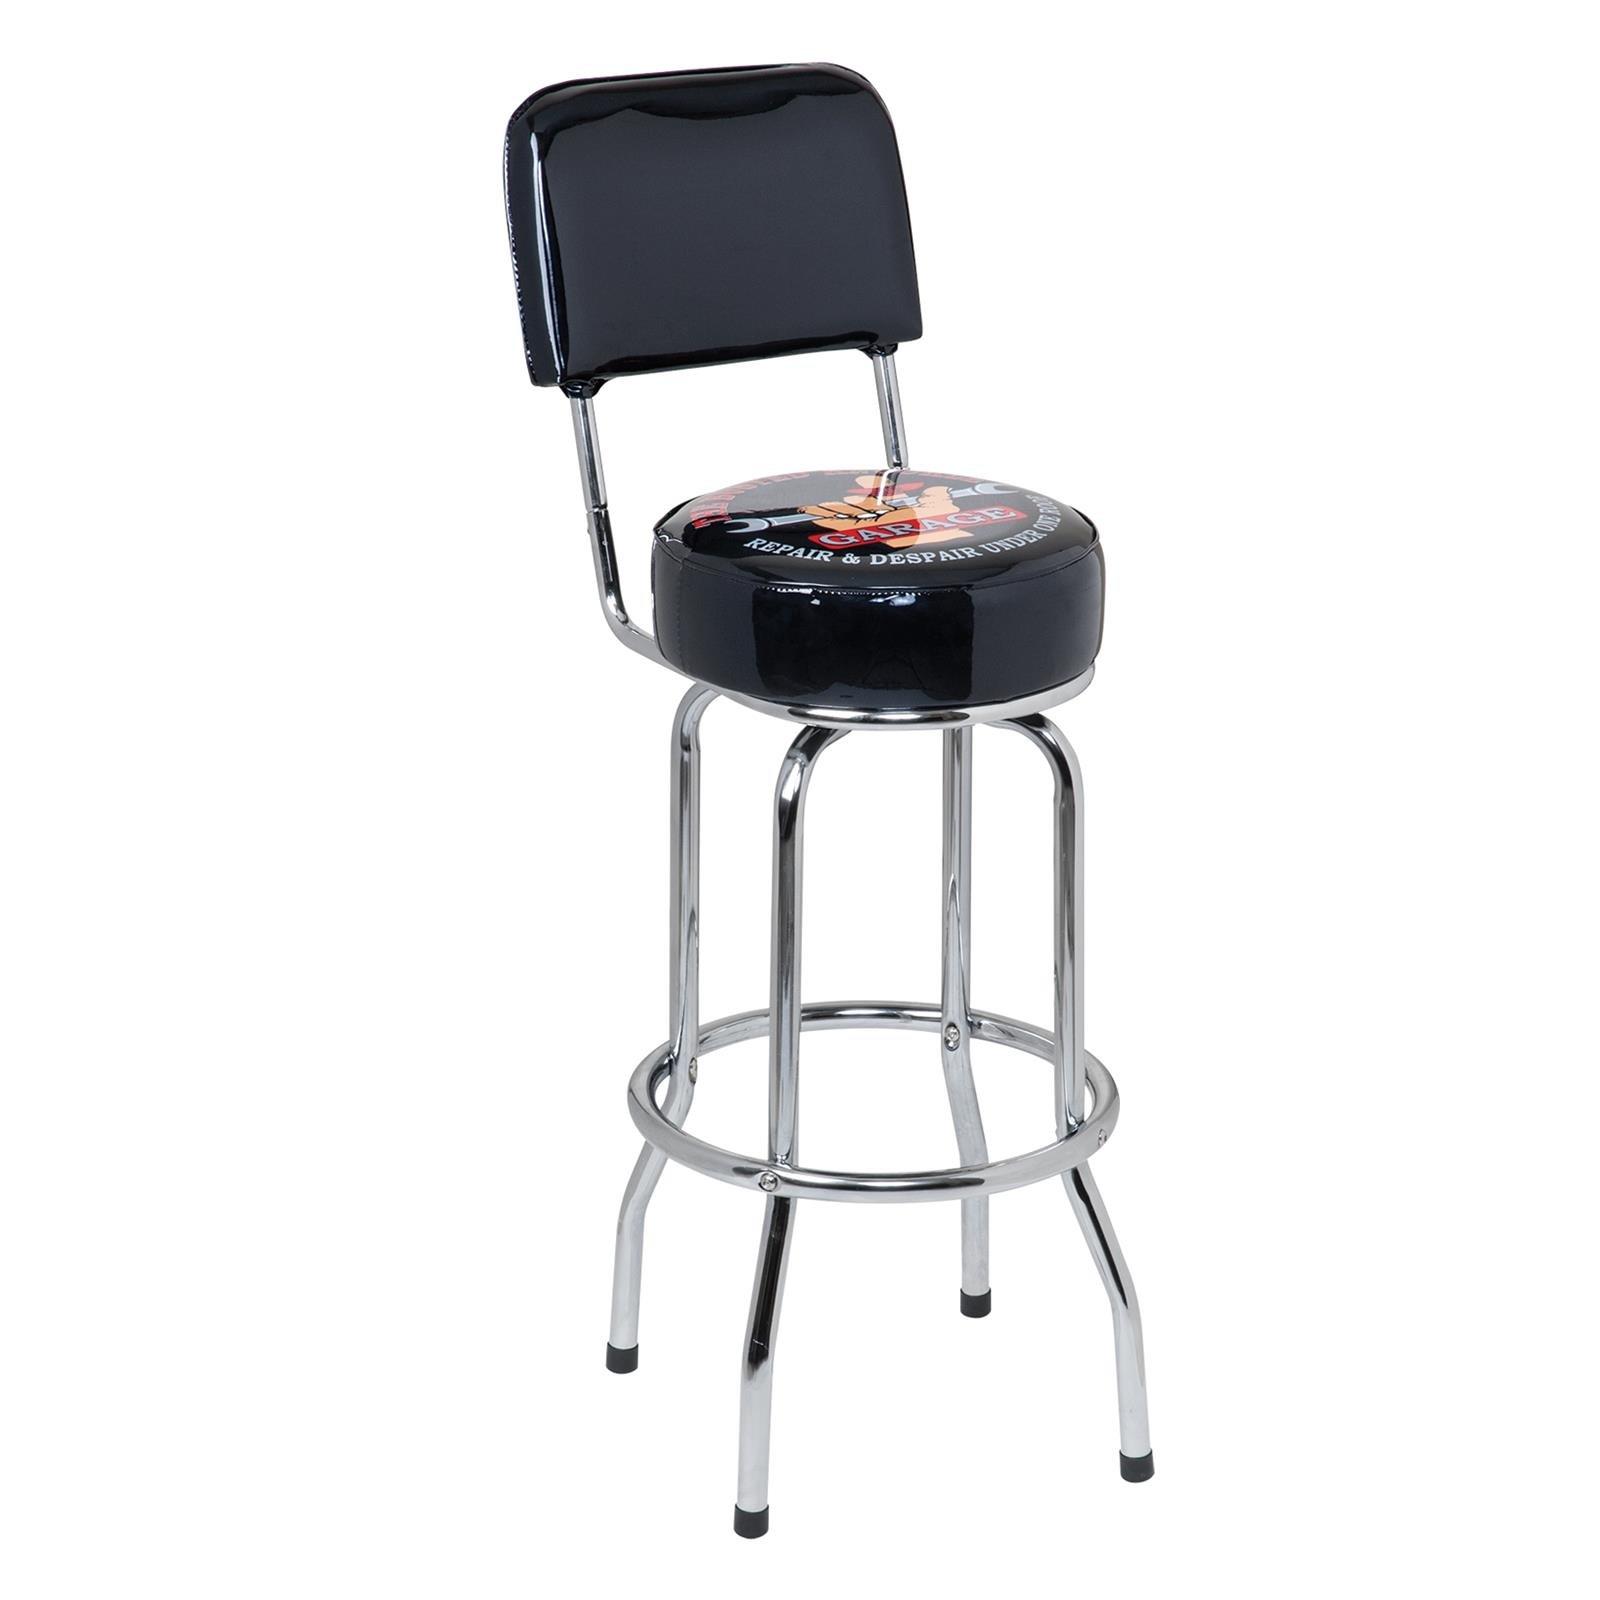 Busted Knuckle Garage® Bar Stool with Backrest